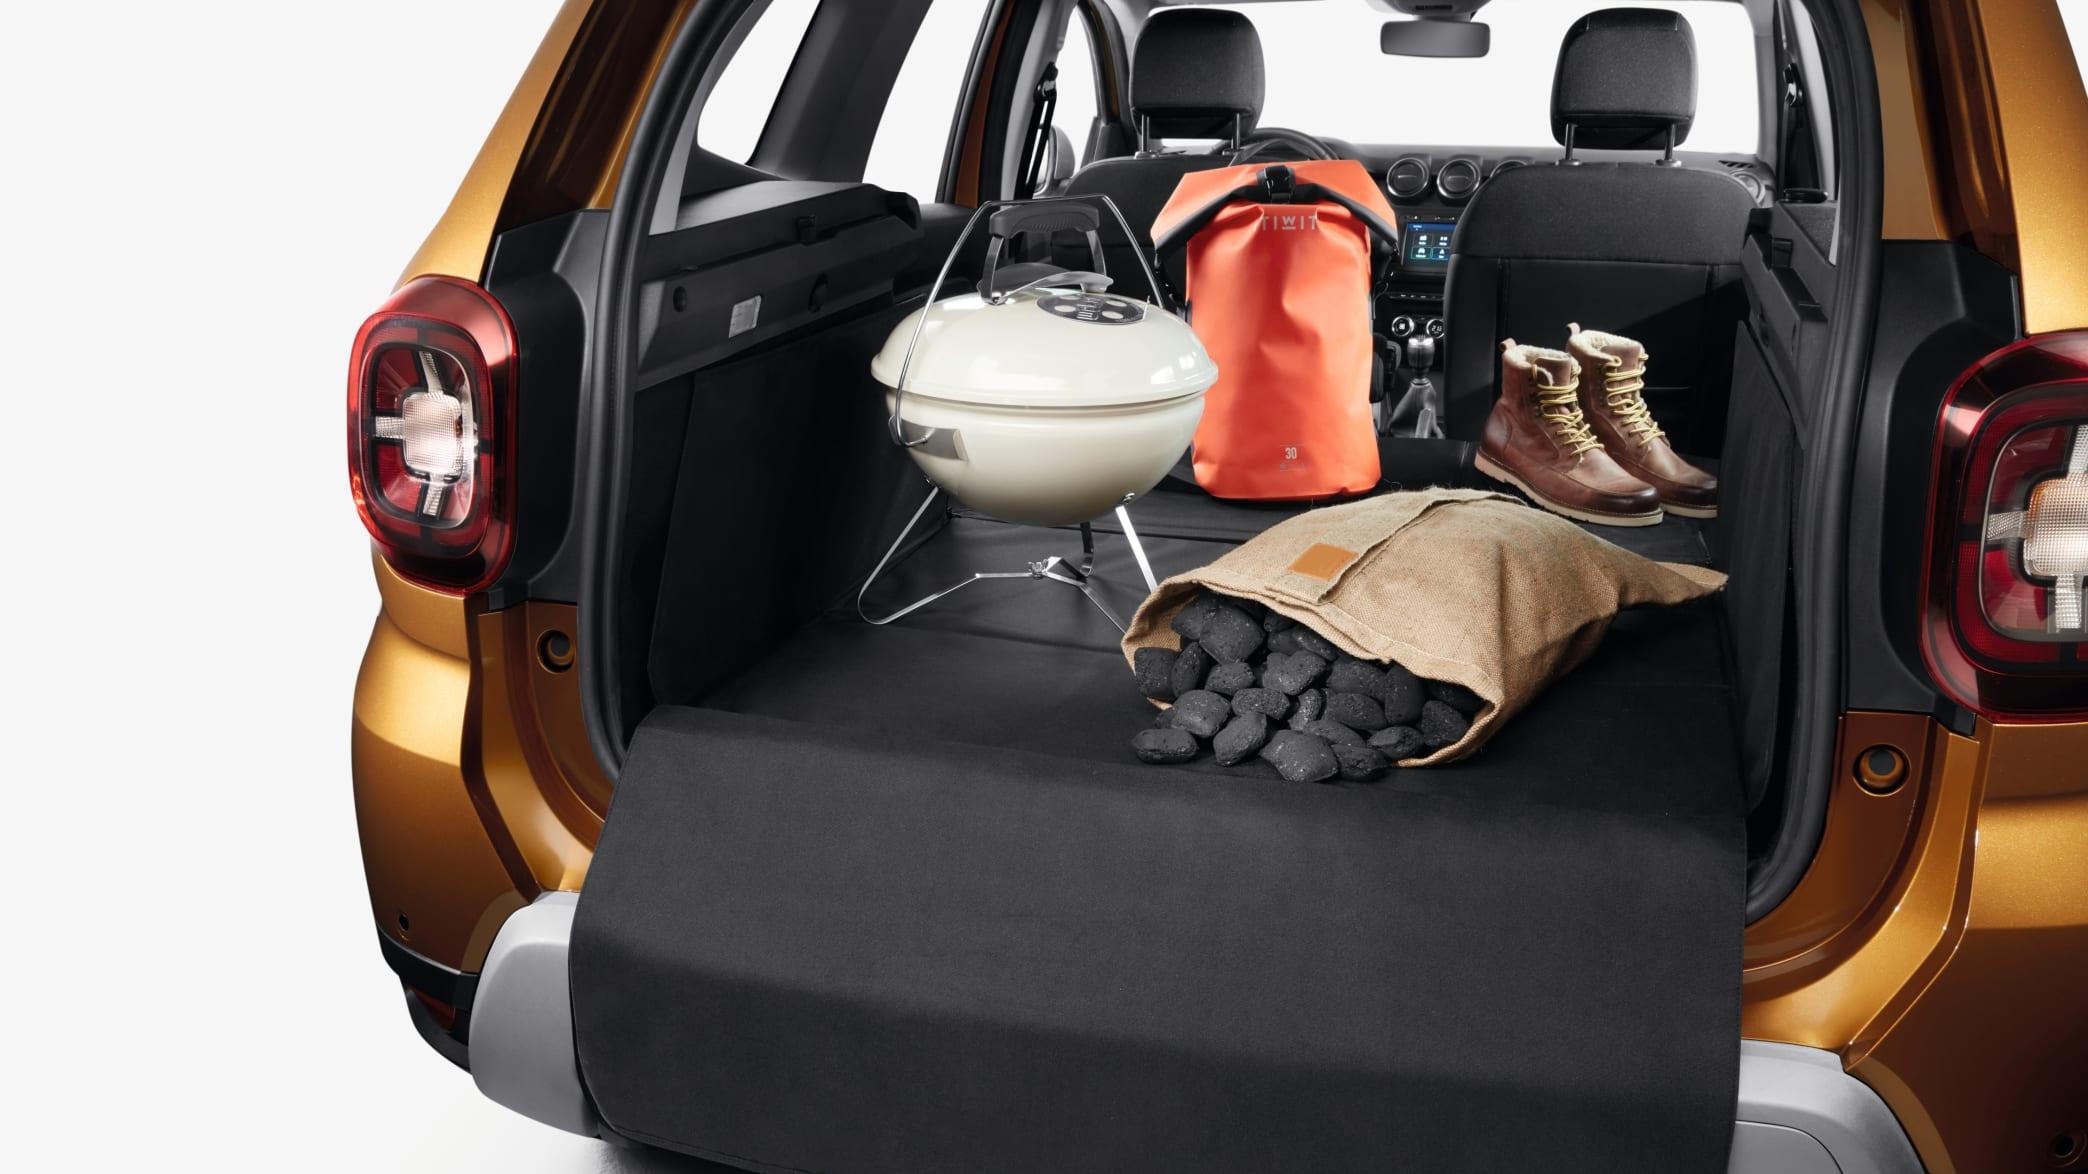 Kofferraum eines Dacia Duster